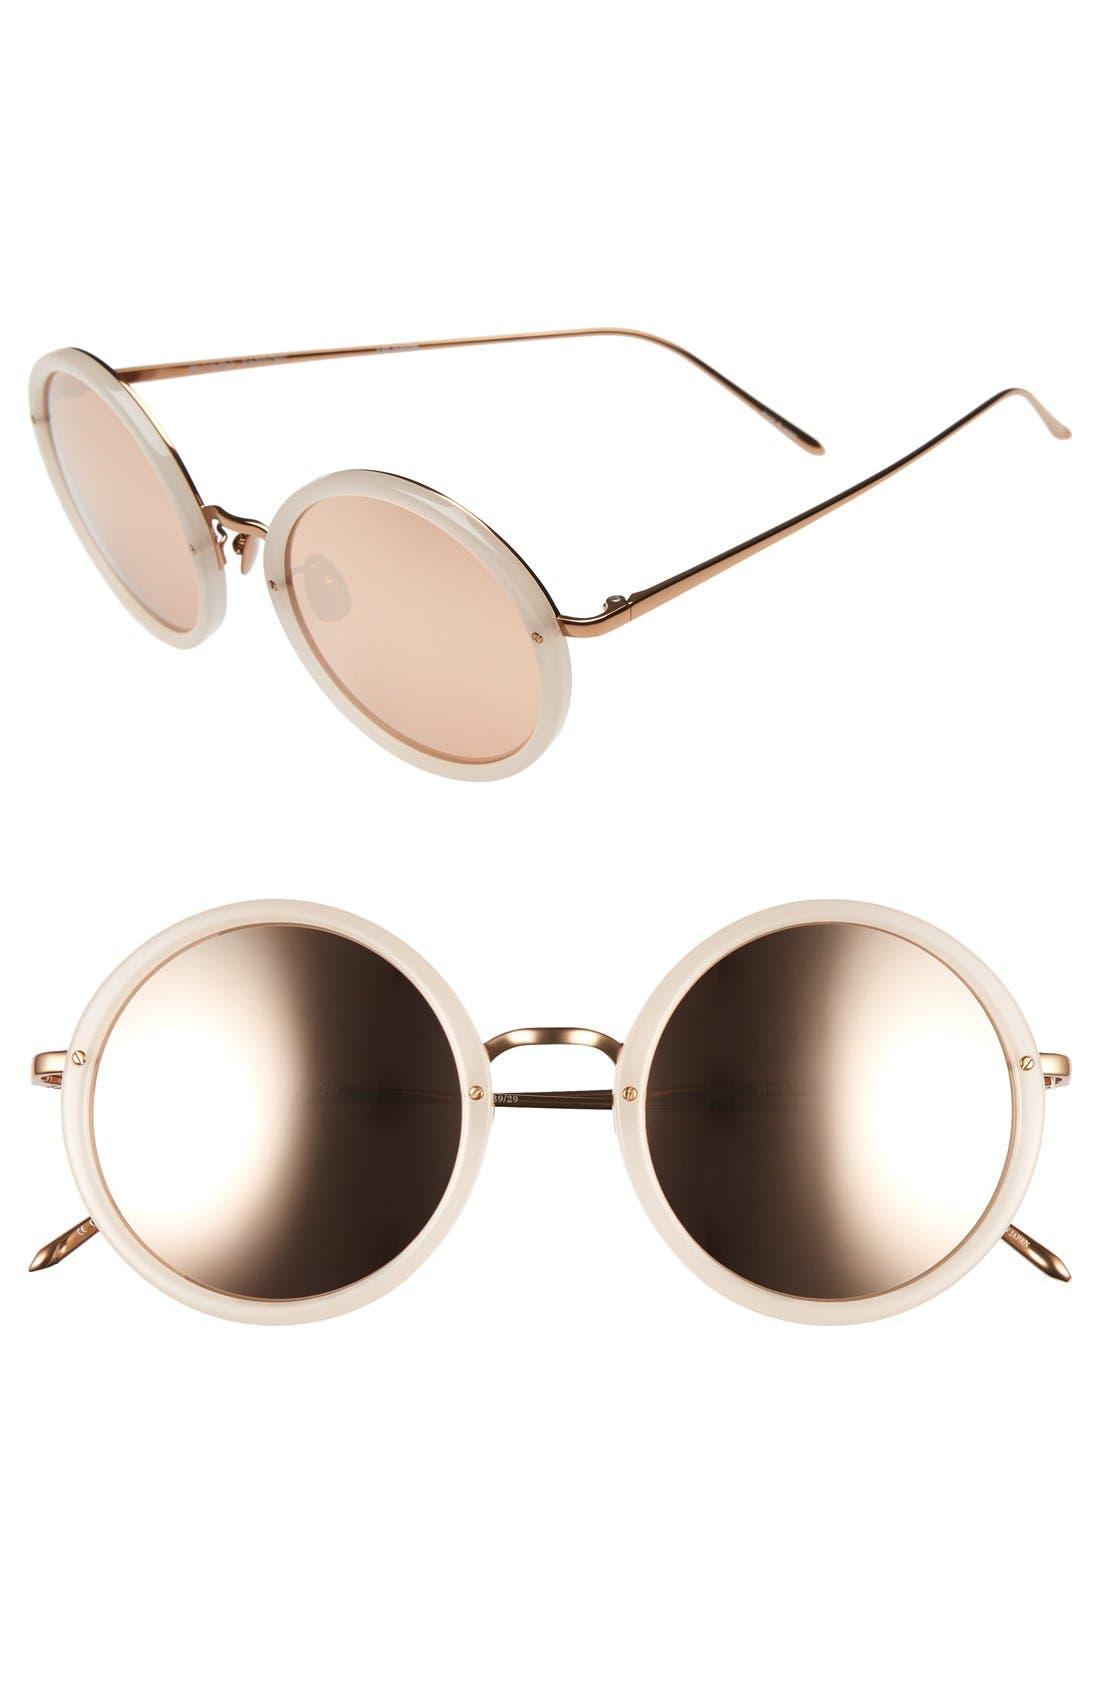 Main Image - Linda Farrow 51mm Round 18 Karat Rose Gold Trim Sunglasses